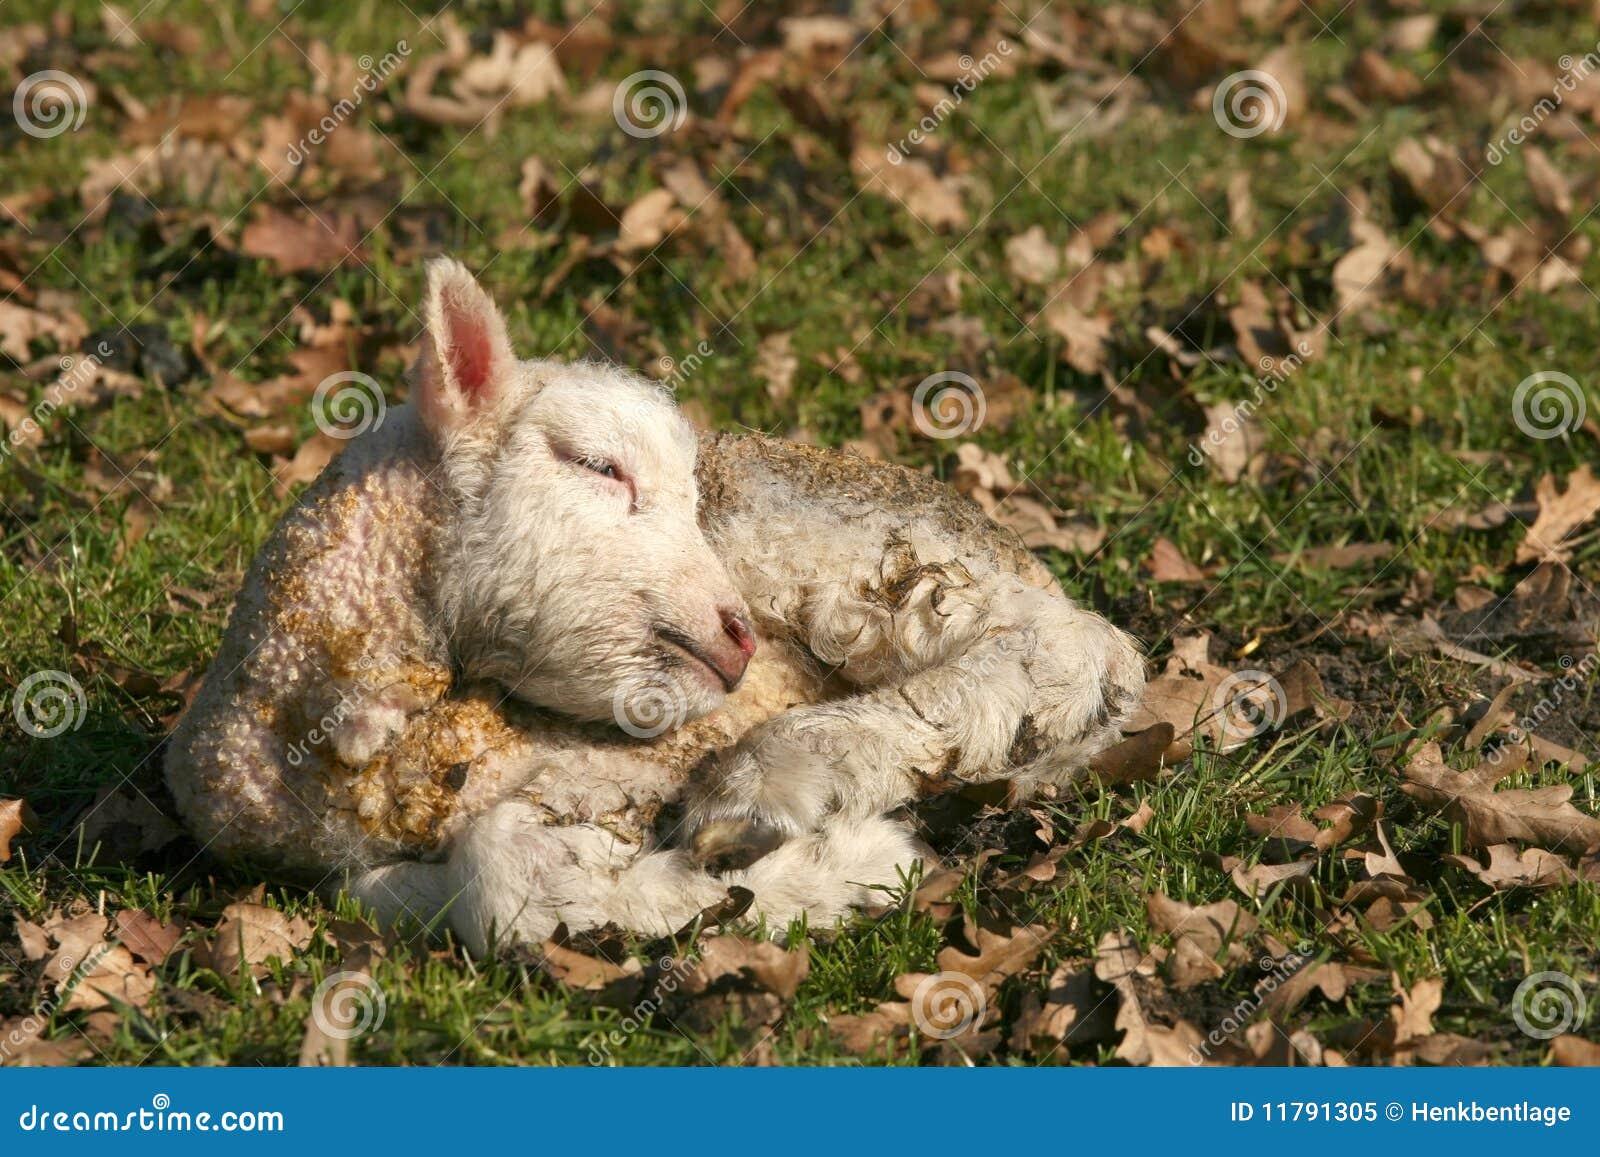 Newborn Lamb Sleeping Royalty Free Stock Photo - Image: 11791305